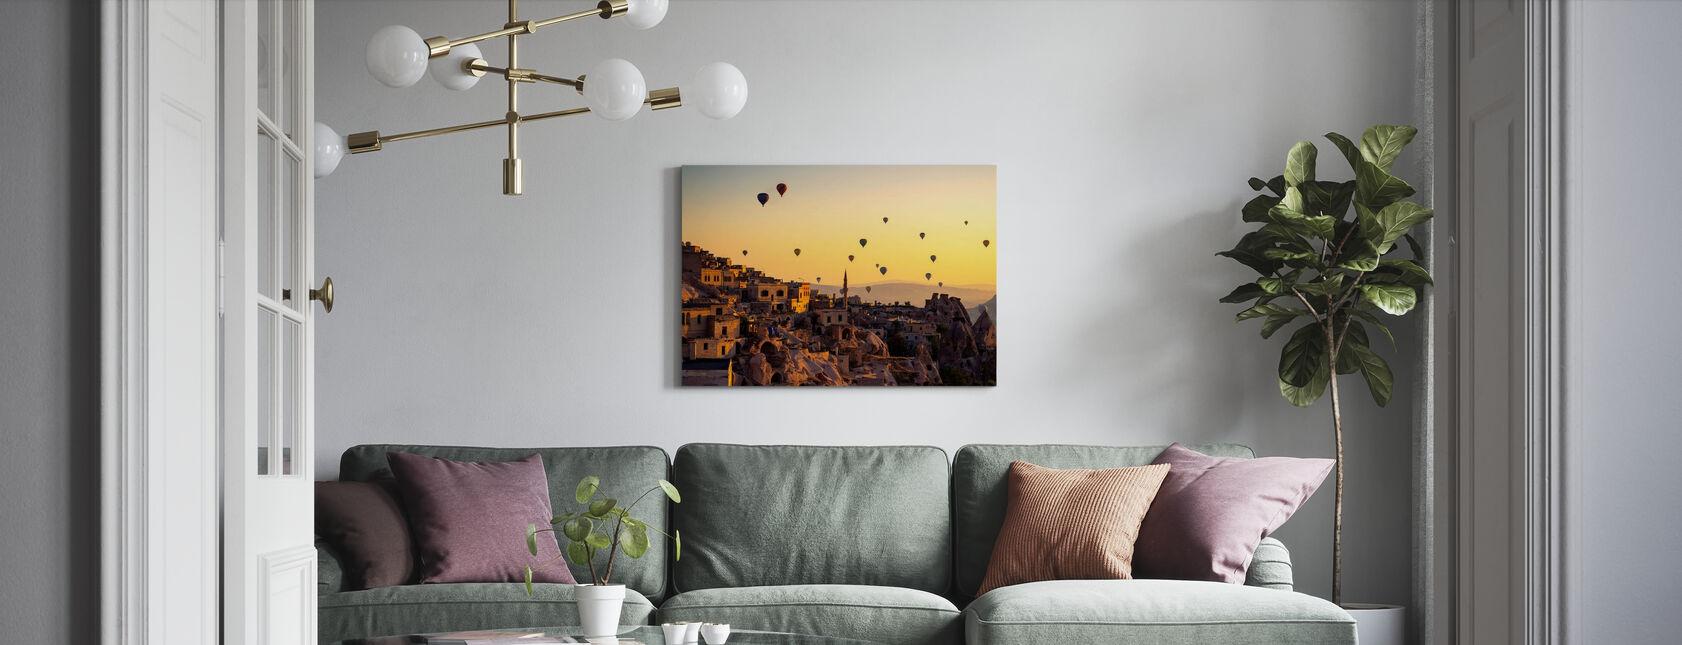 Sunrise Over Cappadocia - Canvas print - Living Room